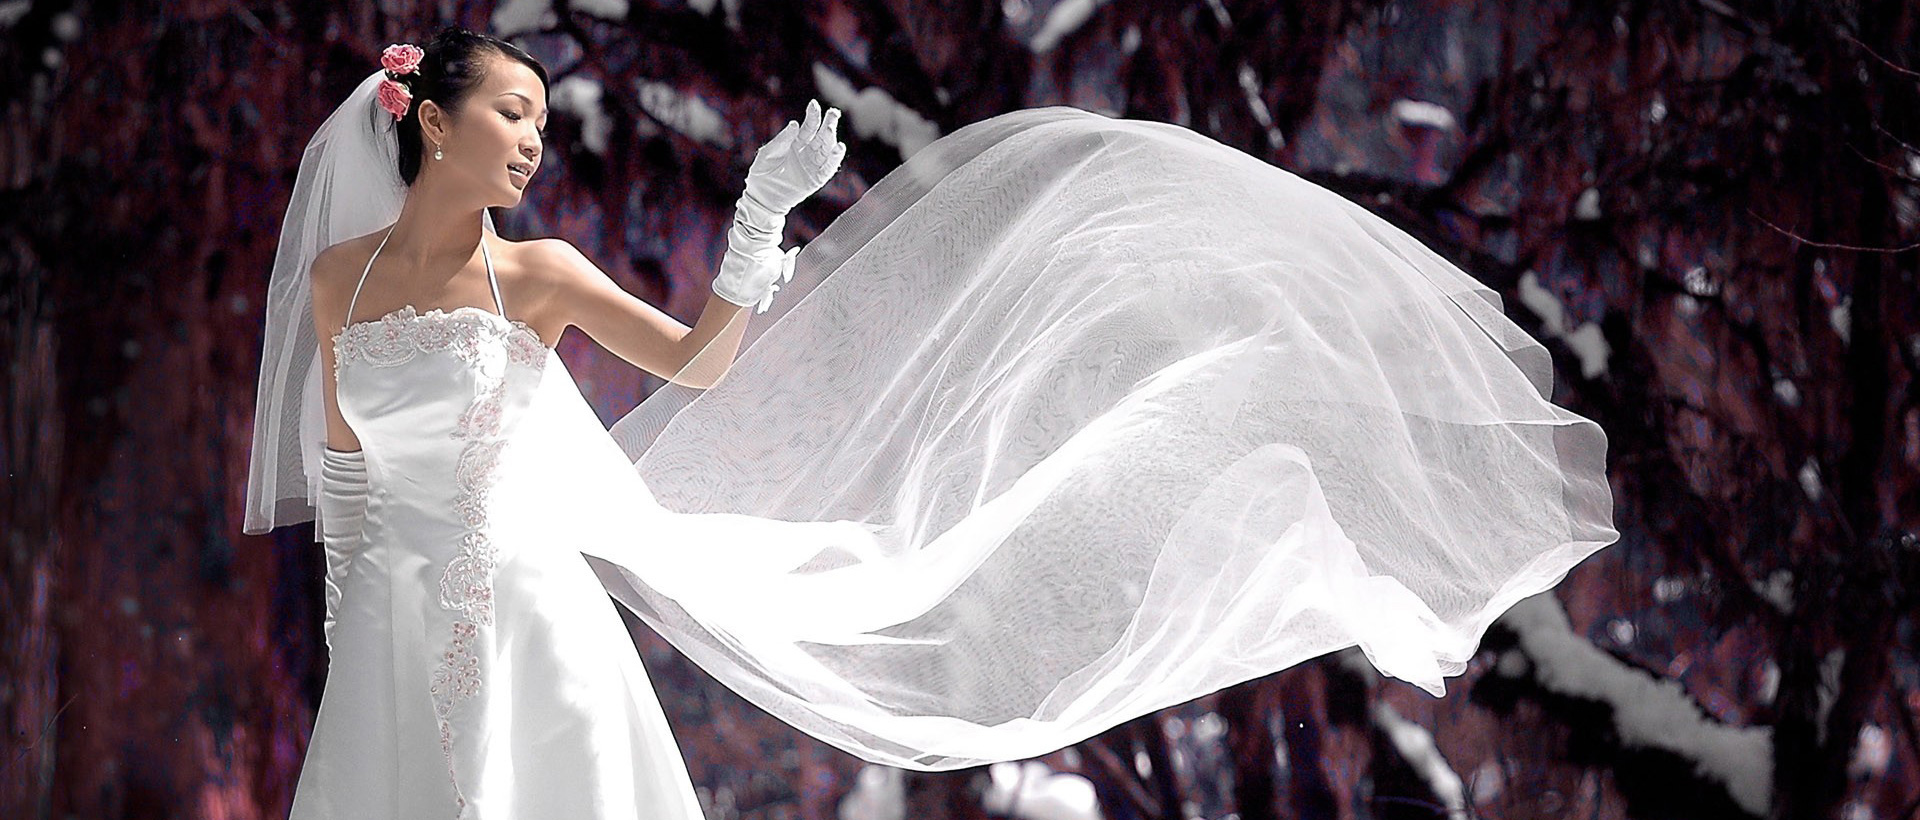 Heiraten in Dänemark | DokumentenService ab 200 EUR